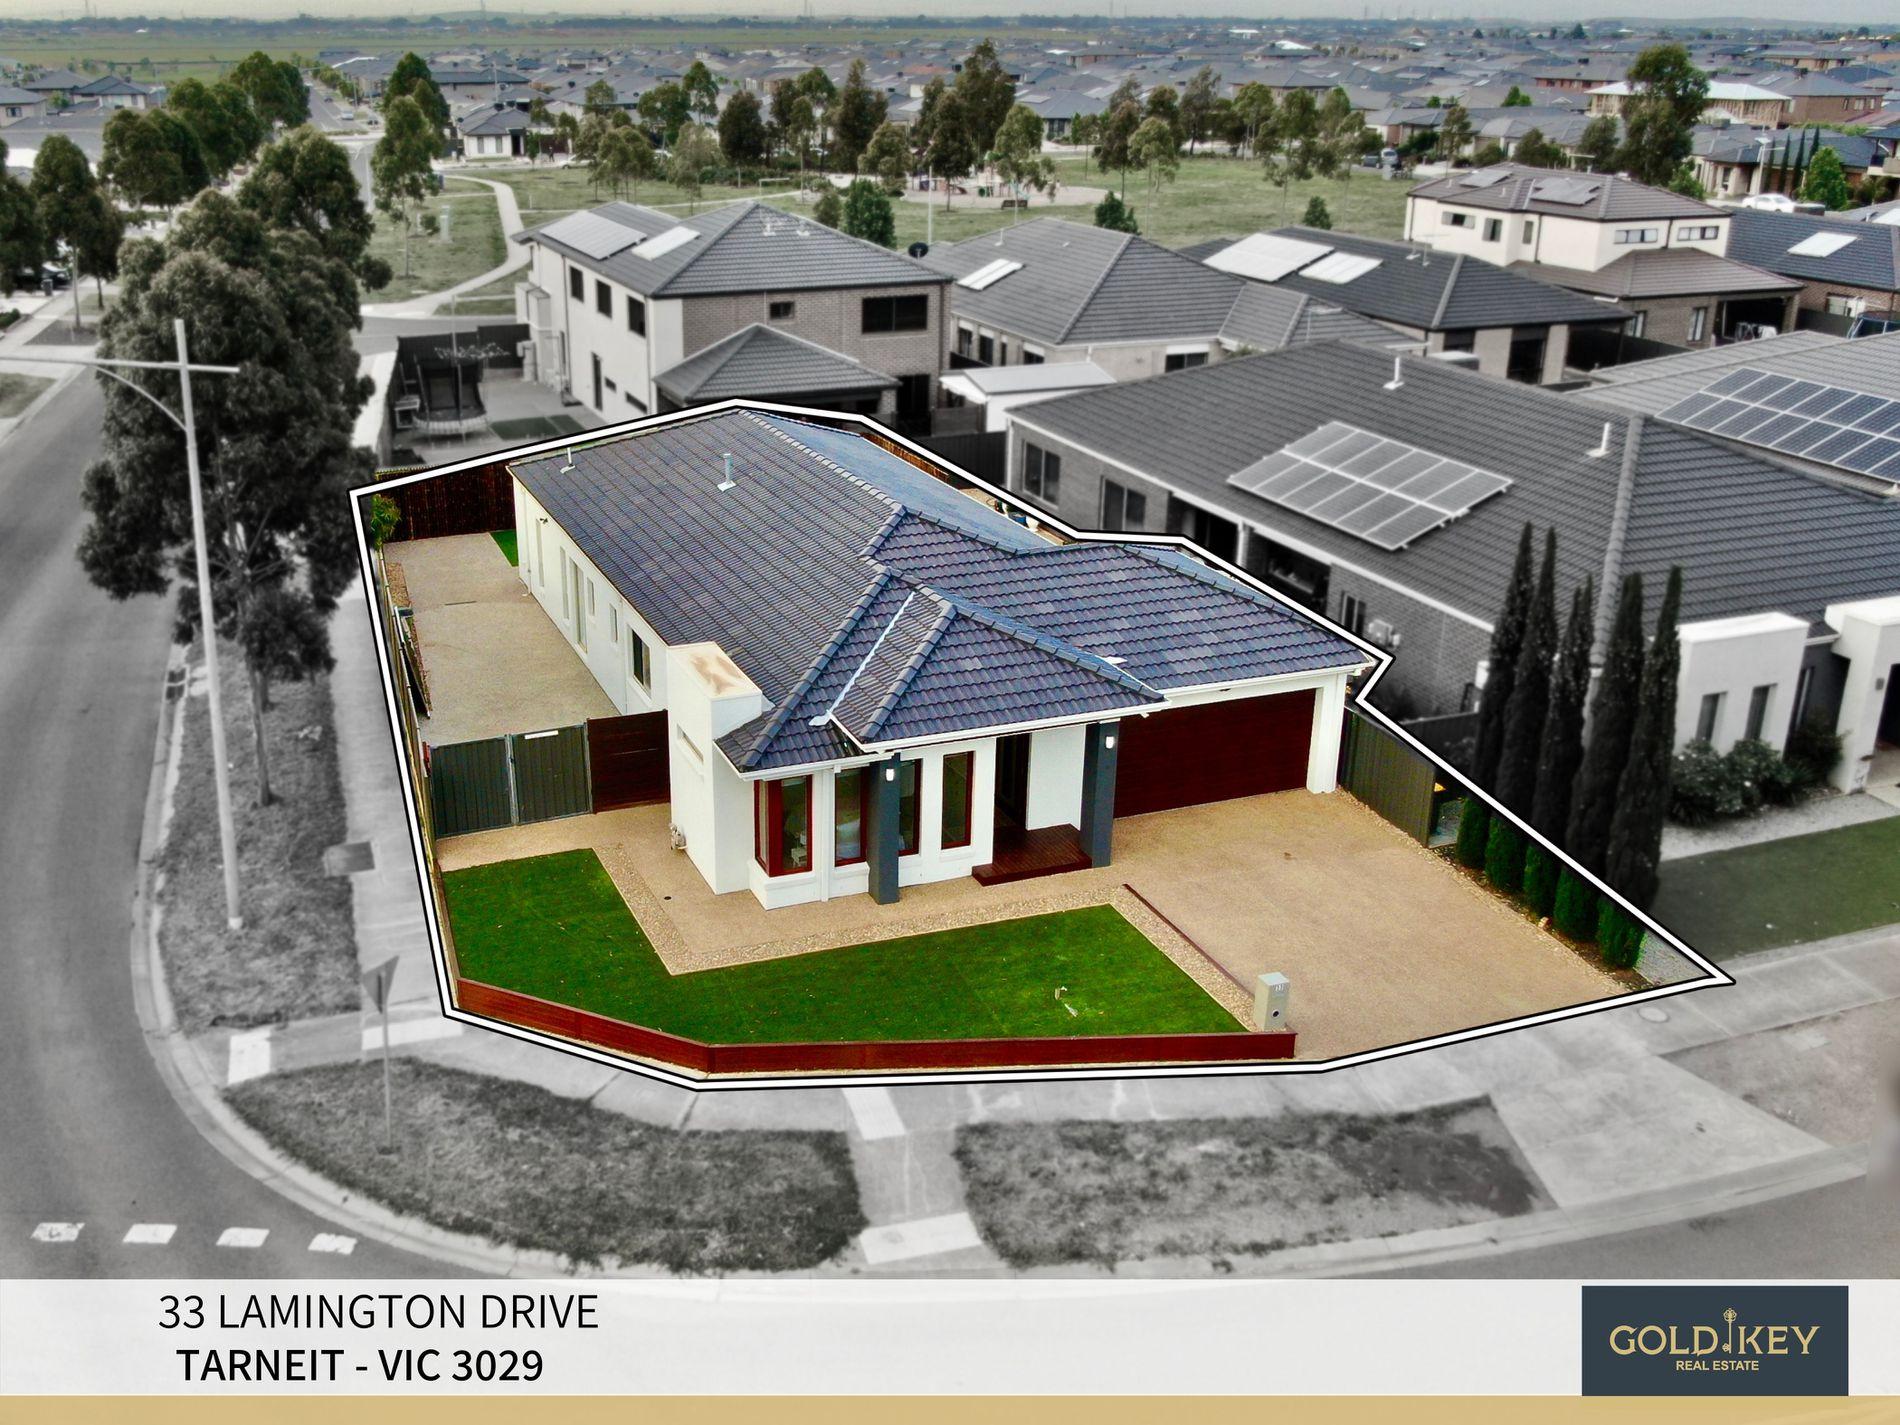 33 Lamington Drive, Tarneit